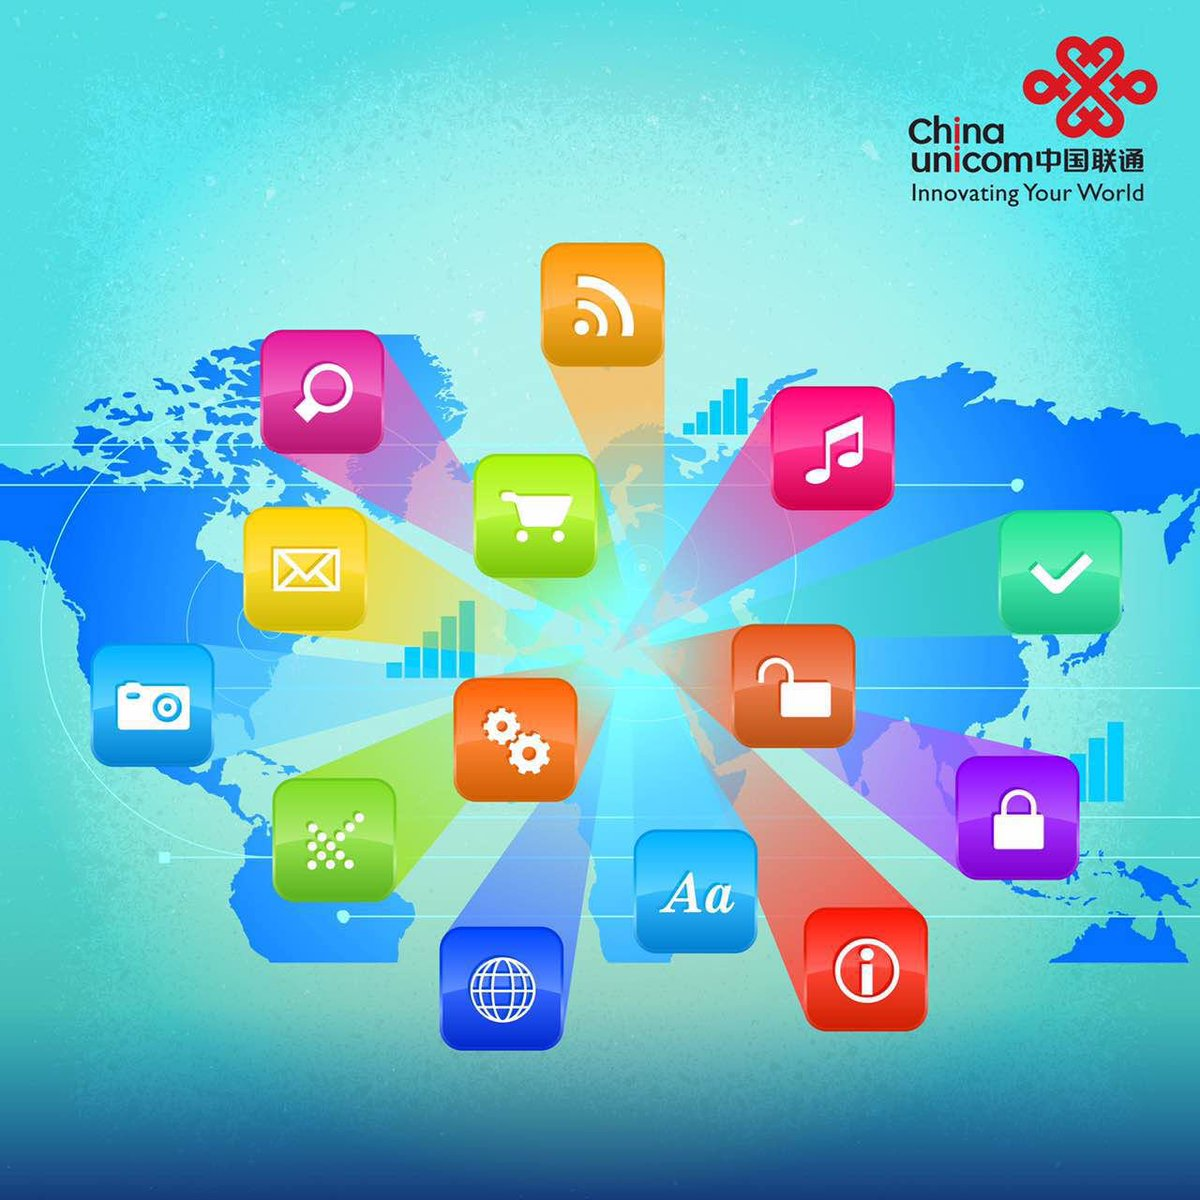 China Unicom Global on Twitter: